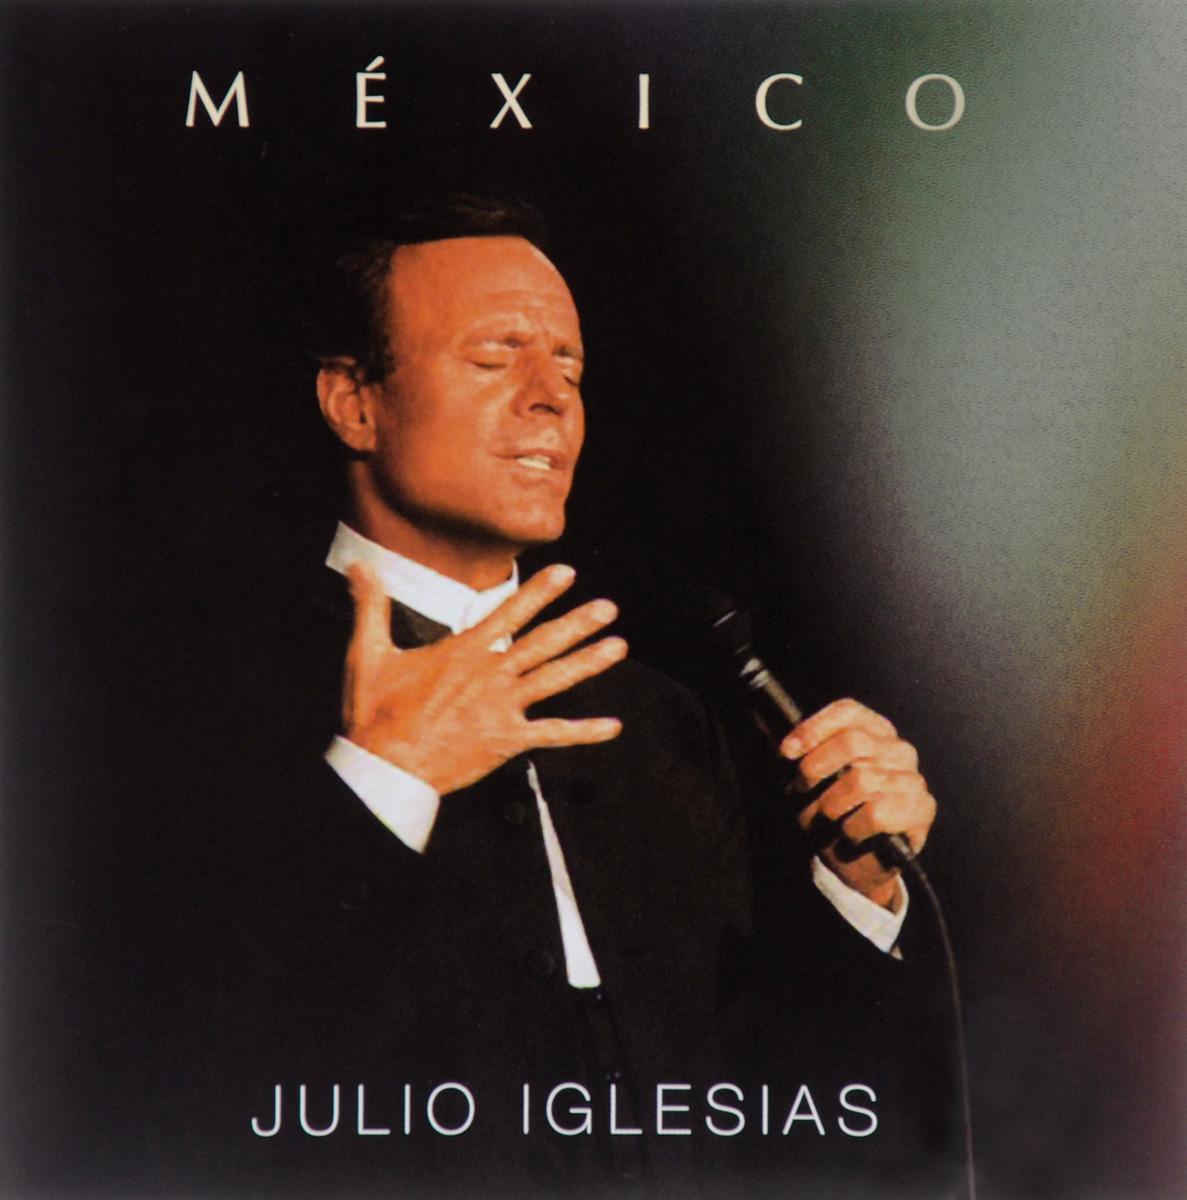 Хулио Иглесиас Julio Iglesias. Mexico julio iglesias 1 2cd